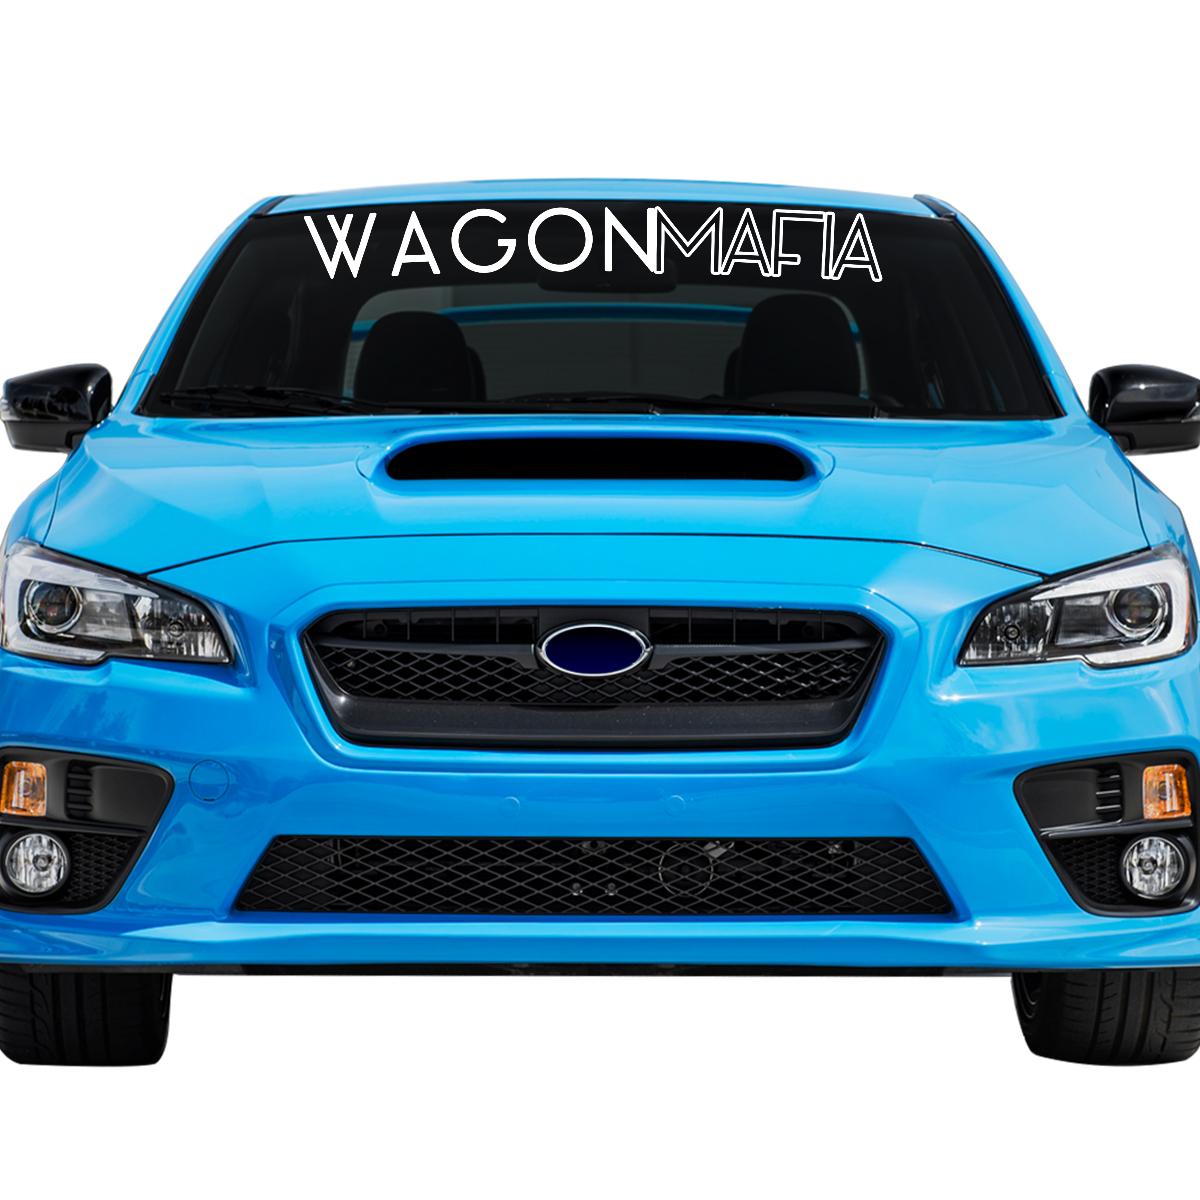 Wagon Mafia Car Windshield Banner Decal Sticker 5 Quot Tall